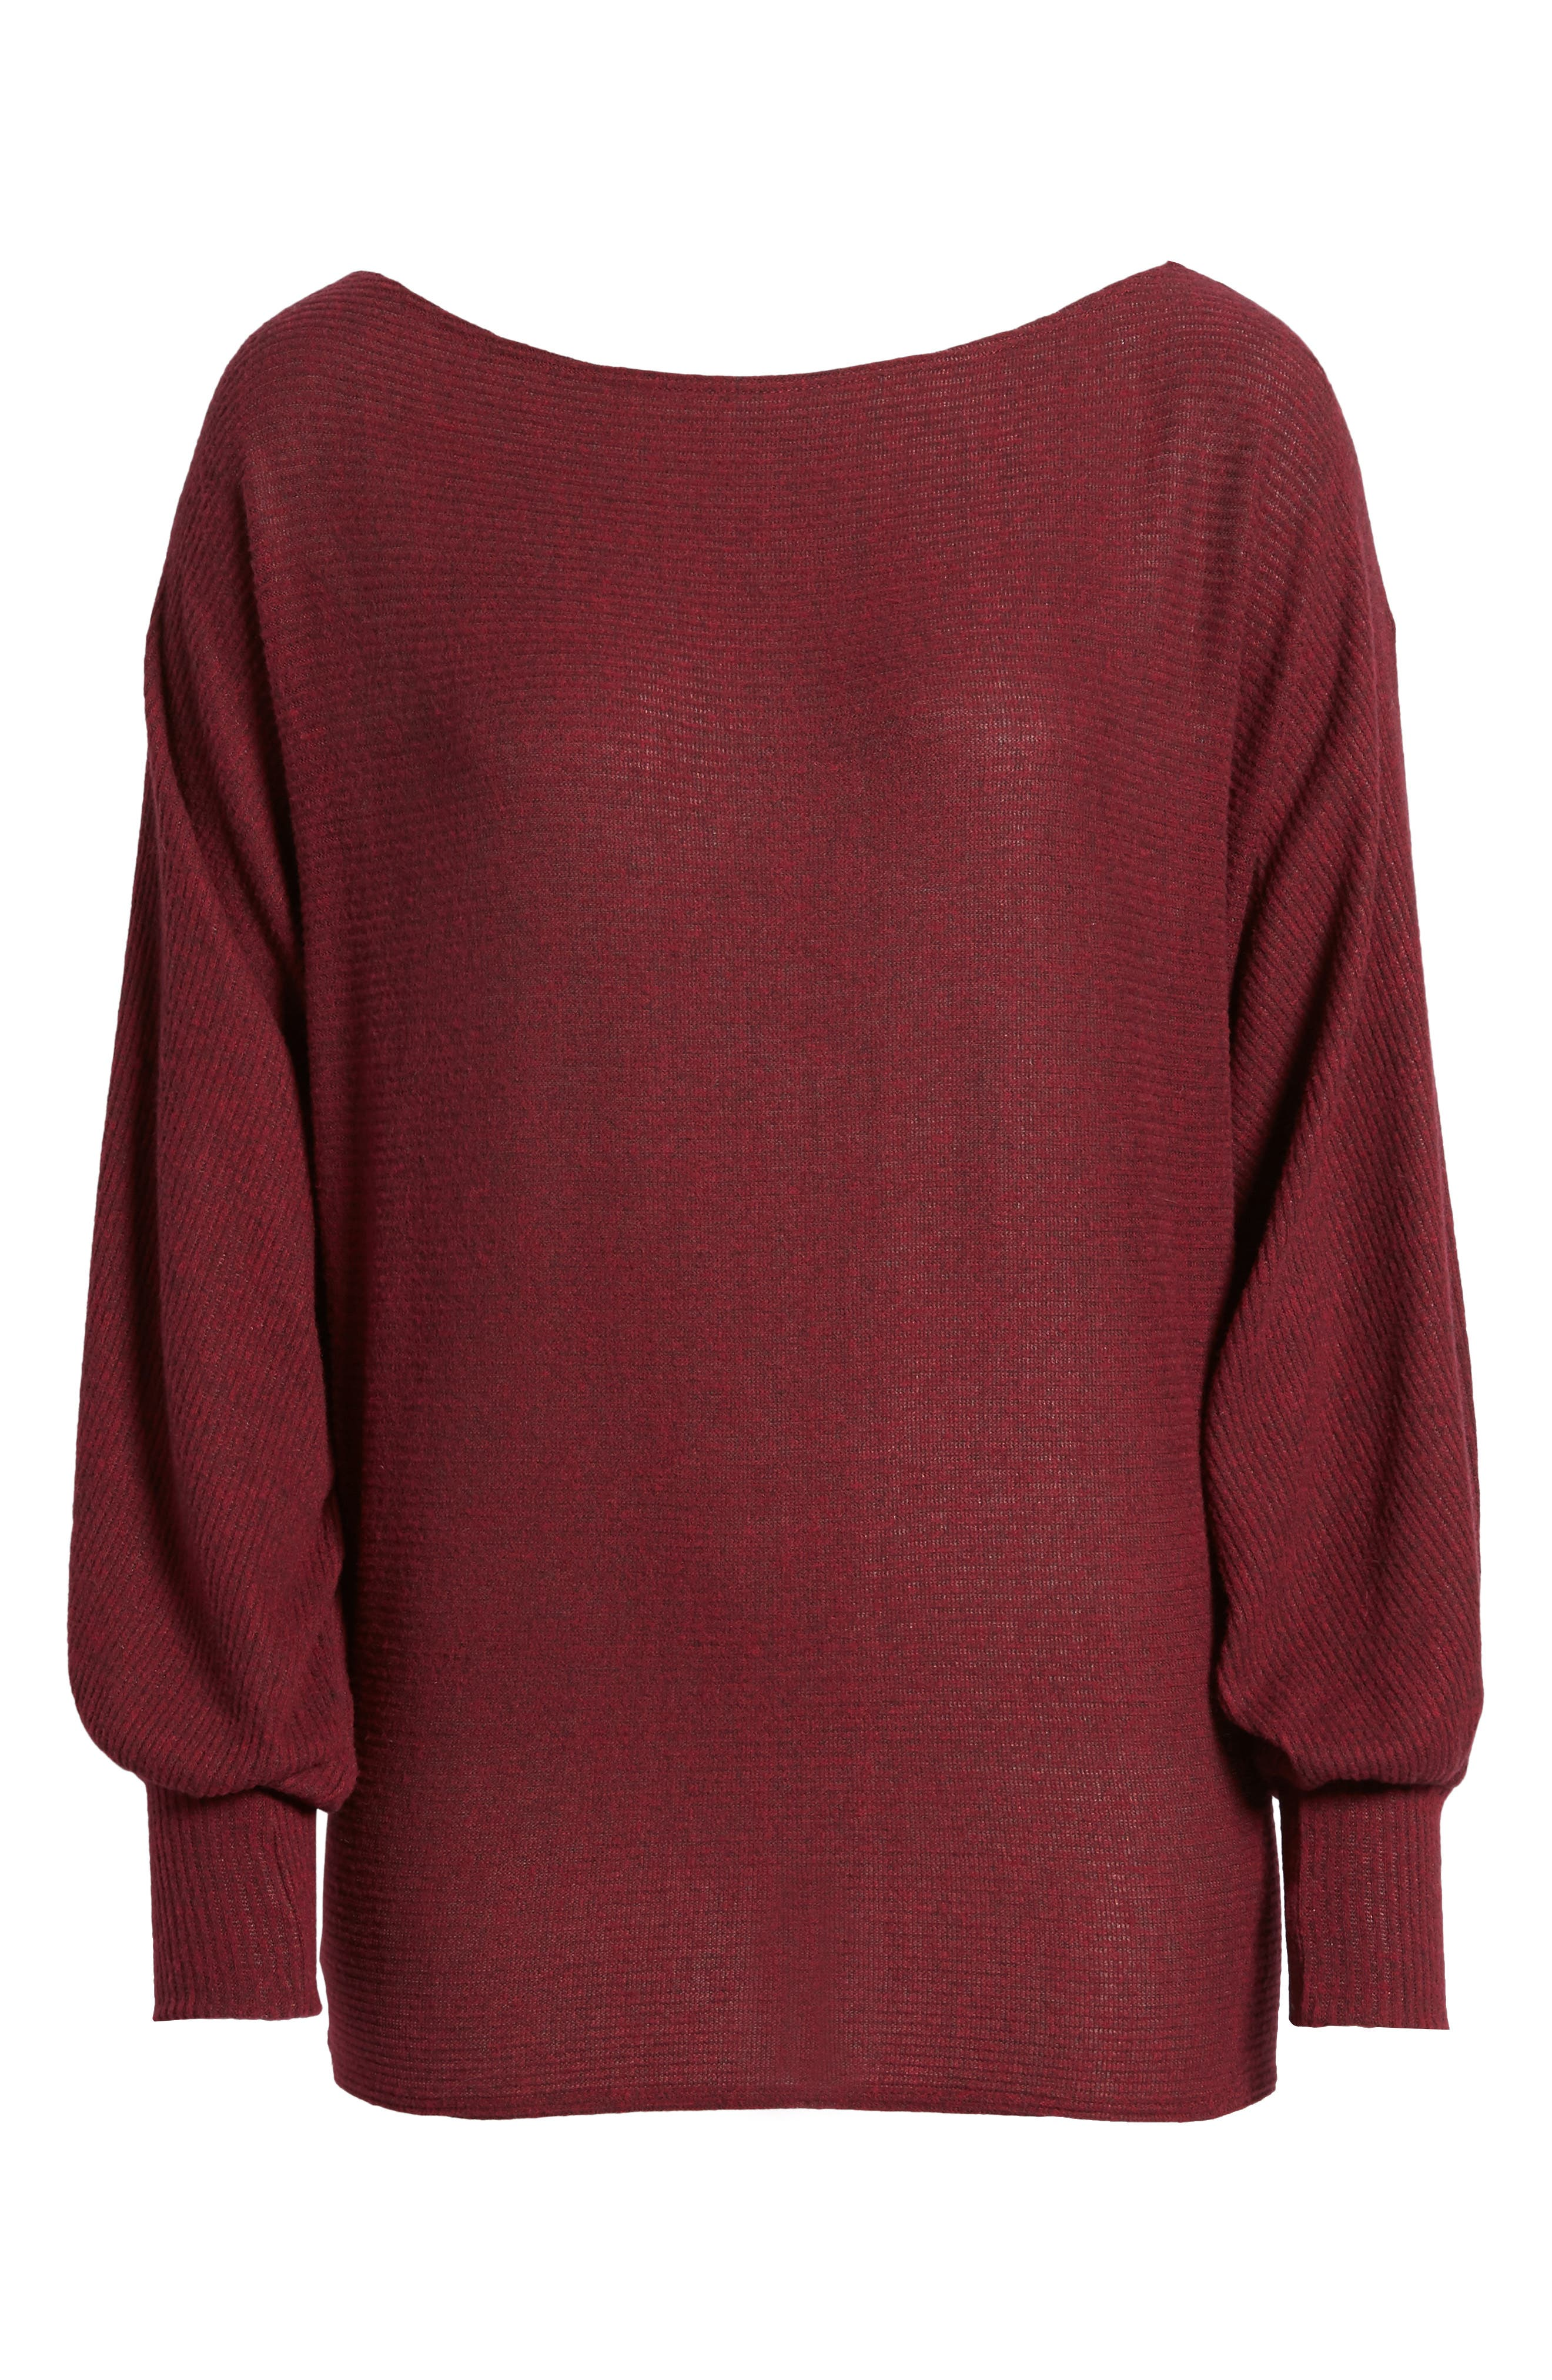 Balloon Sleeve Sweater,                             Alternate thumbnail 6, color,                             930